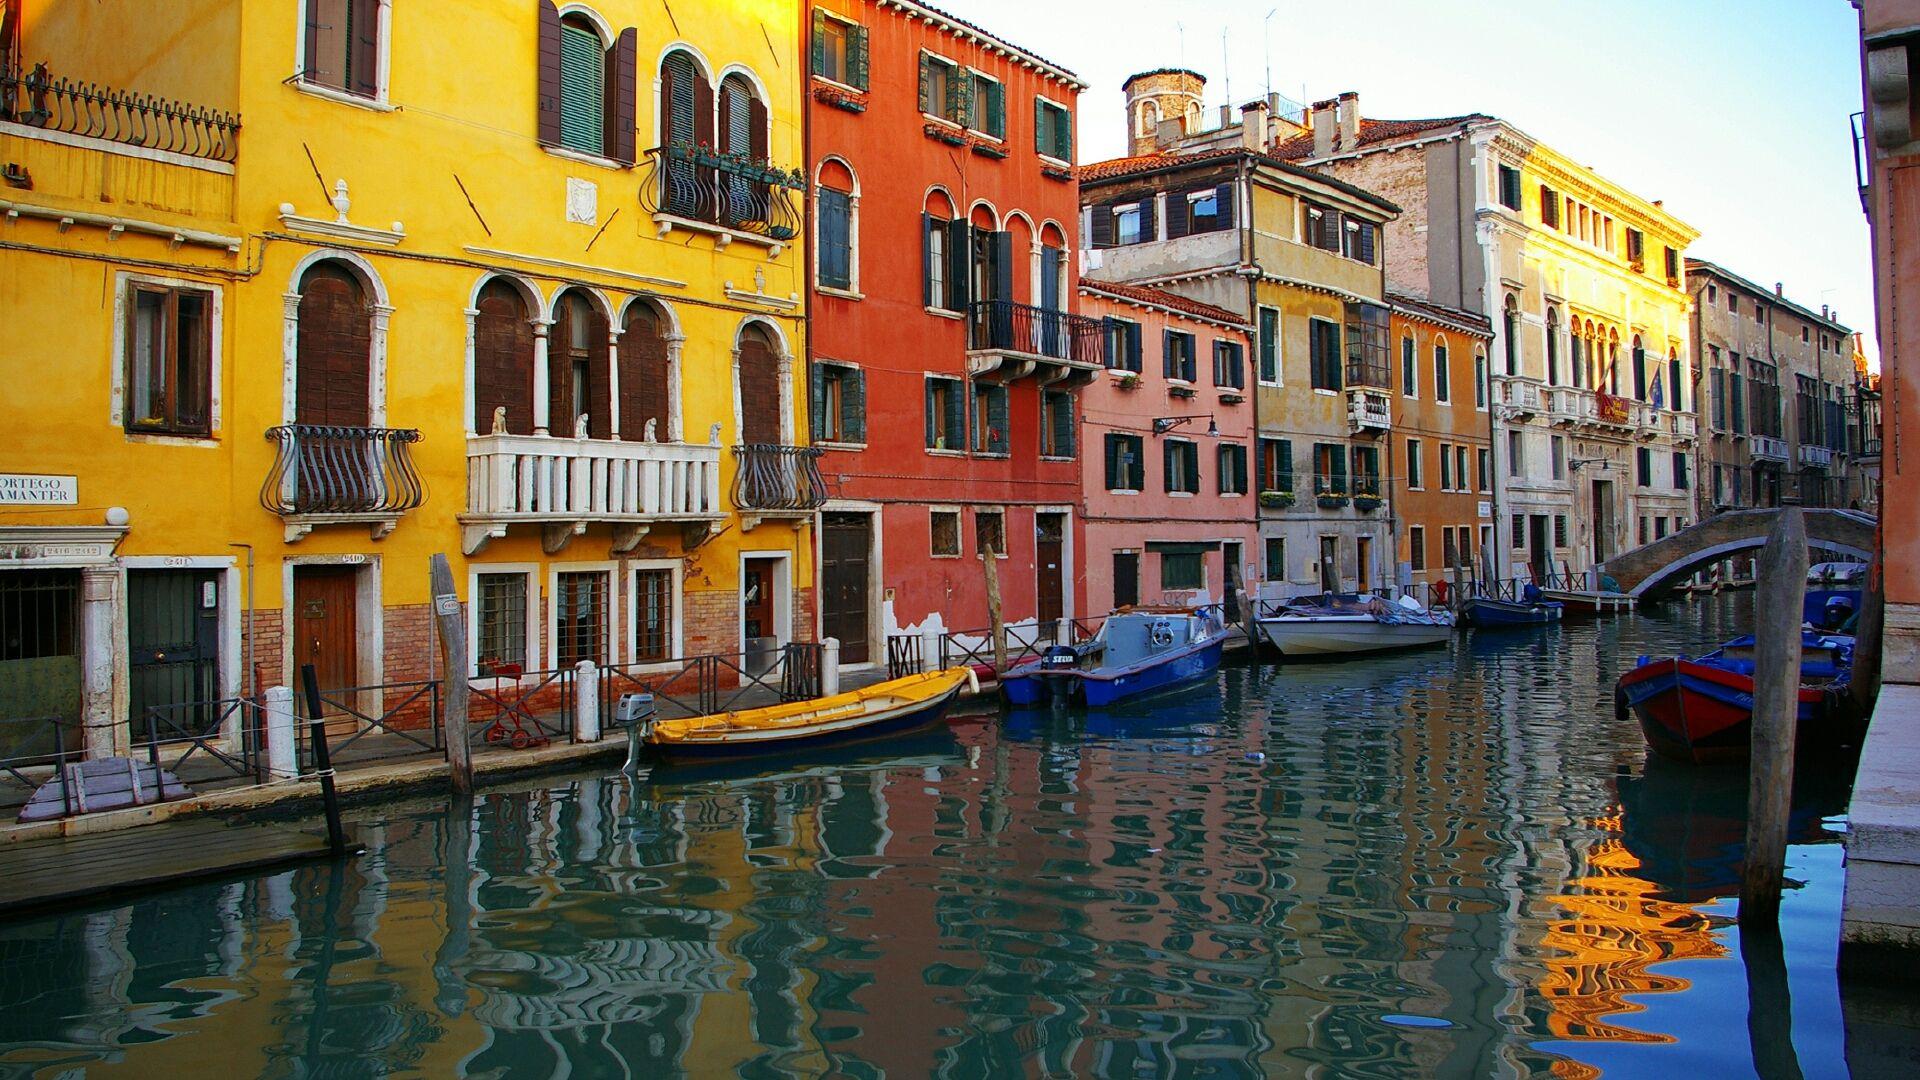 free Buildings Venice wallpaper, resolution : 1920 x tags: Buildings,  Venice, Gondolas, Canal.